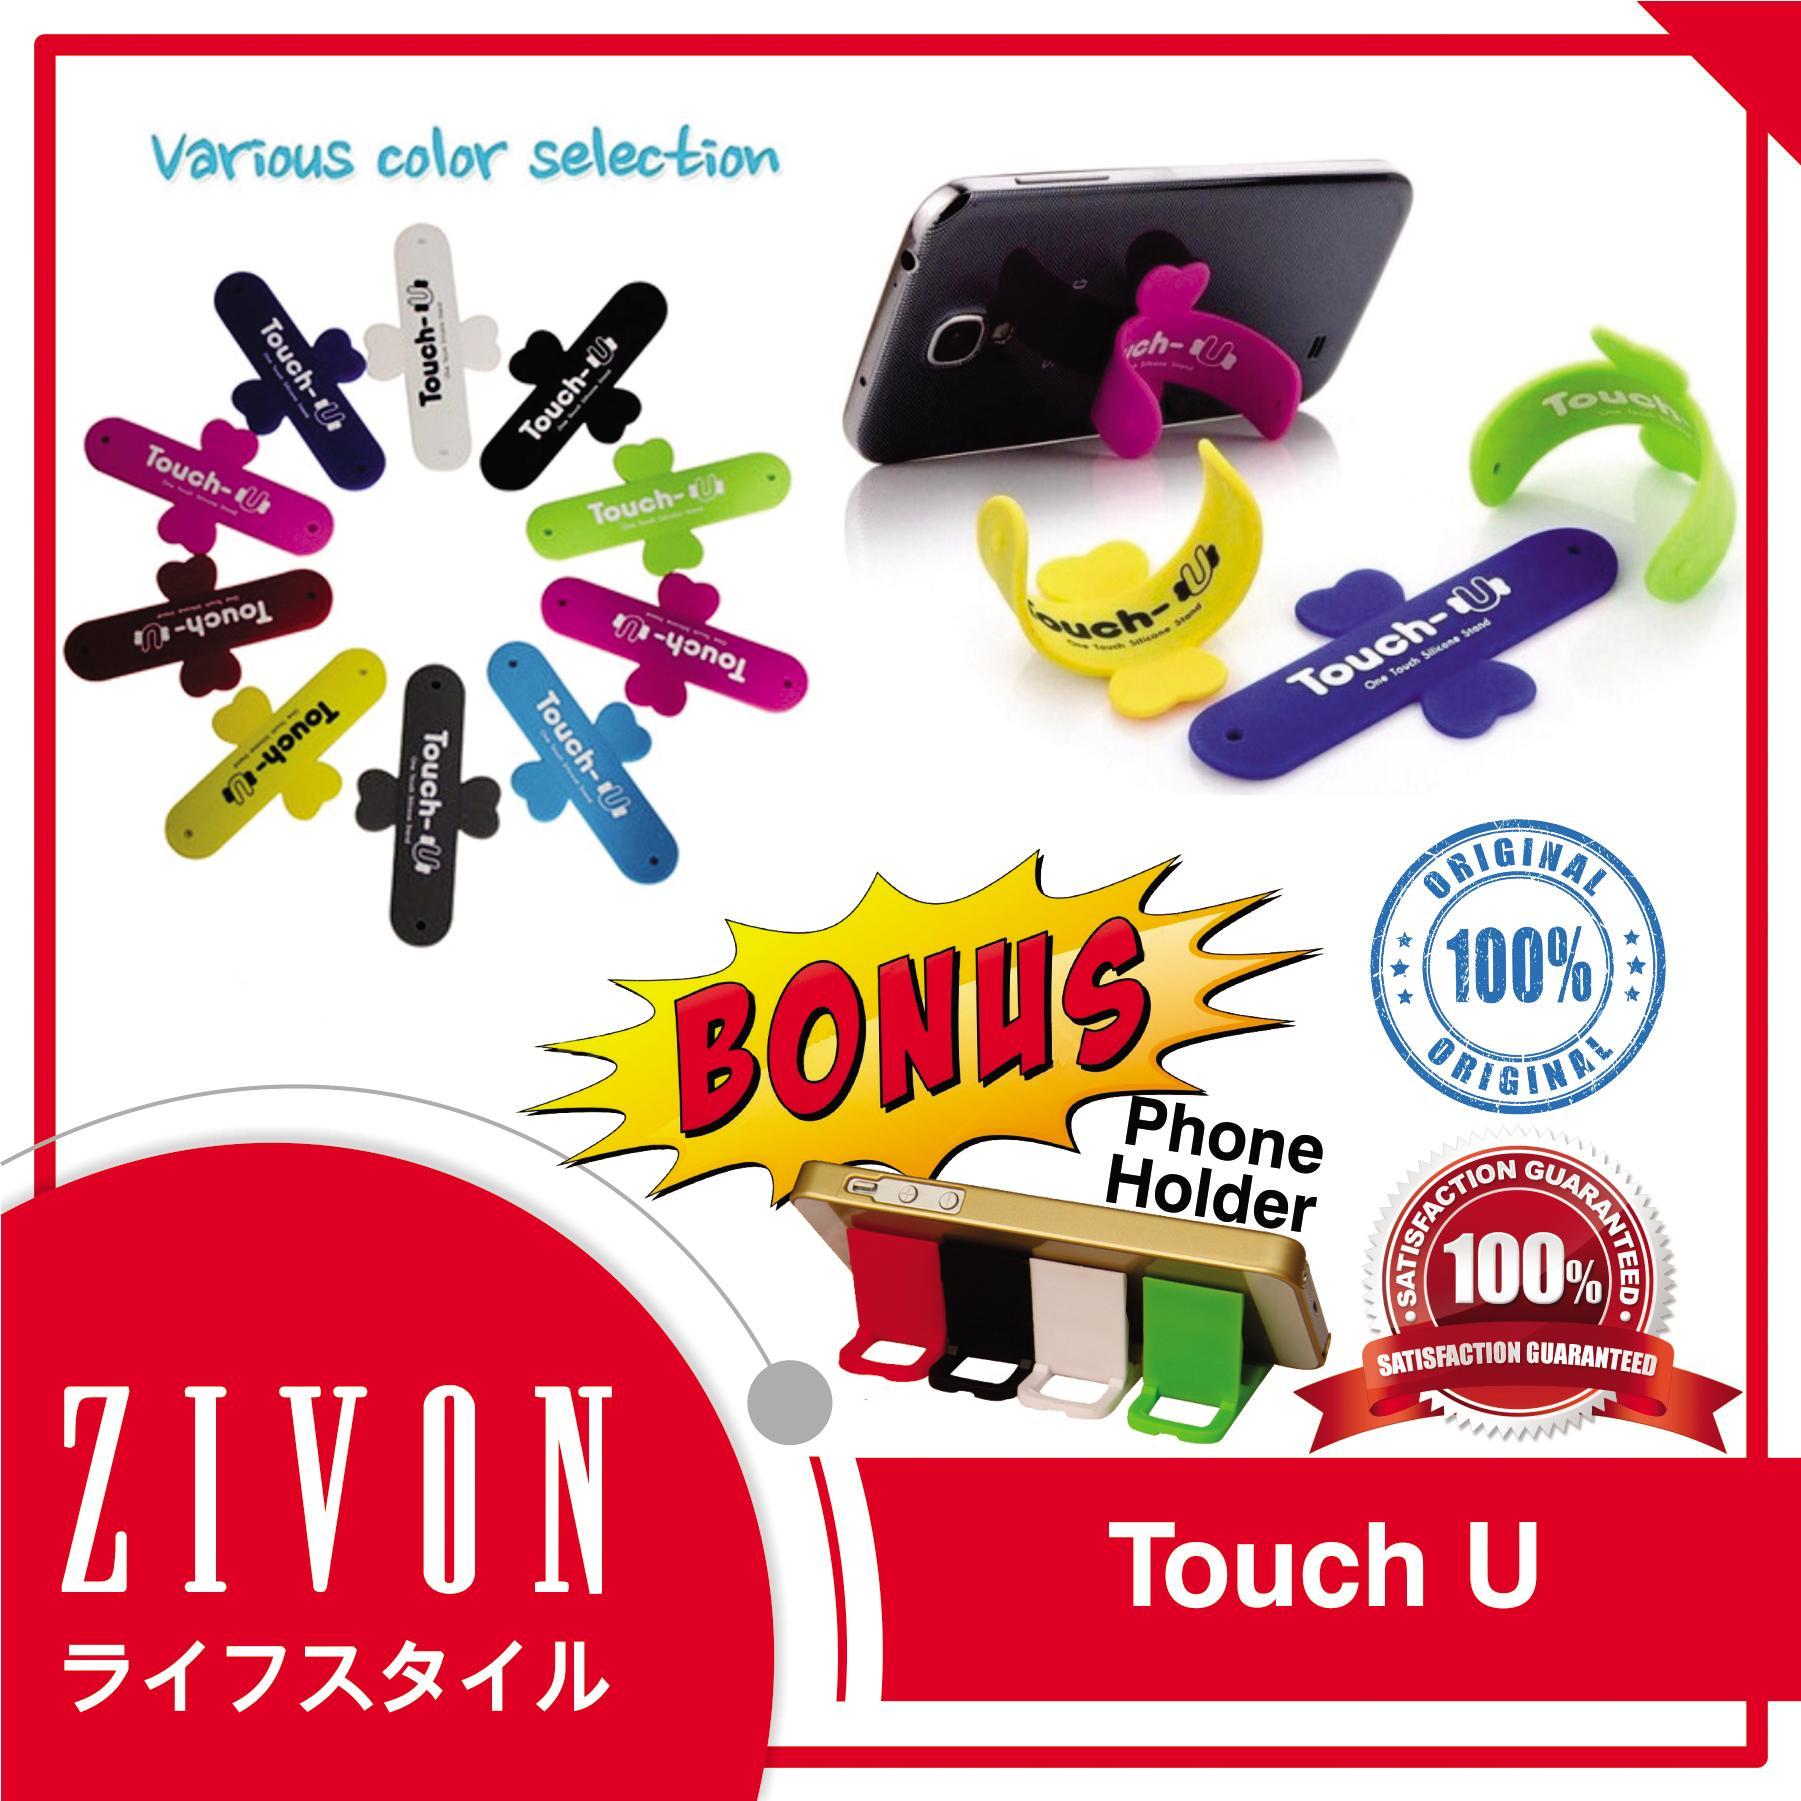 Touch U Beli 1 GRATIS 3 Senderan HP YZF46